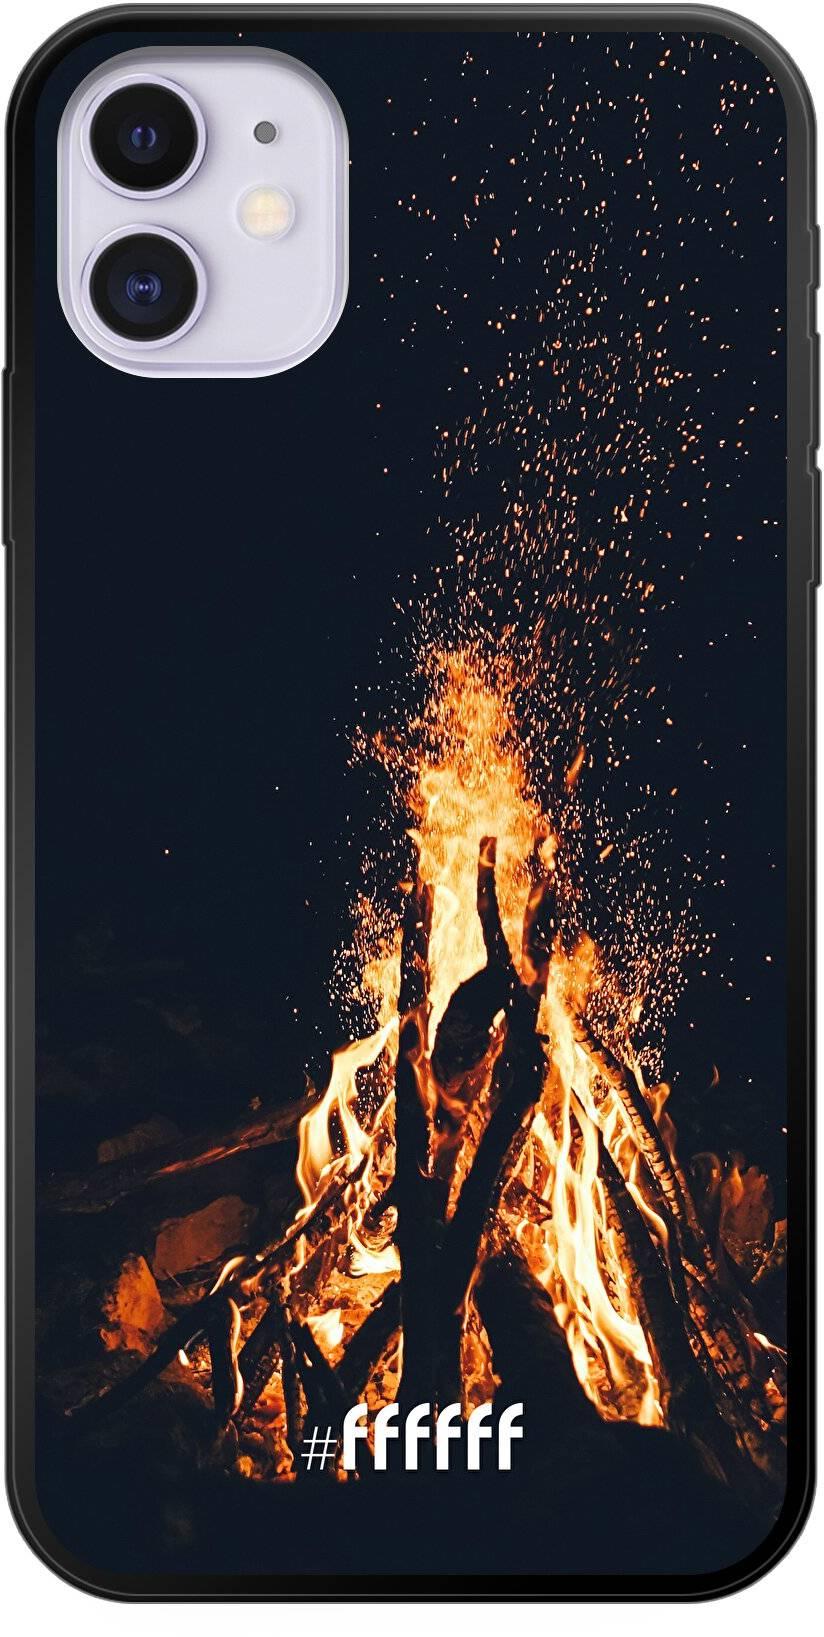 Bonfire iPhone 11